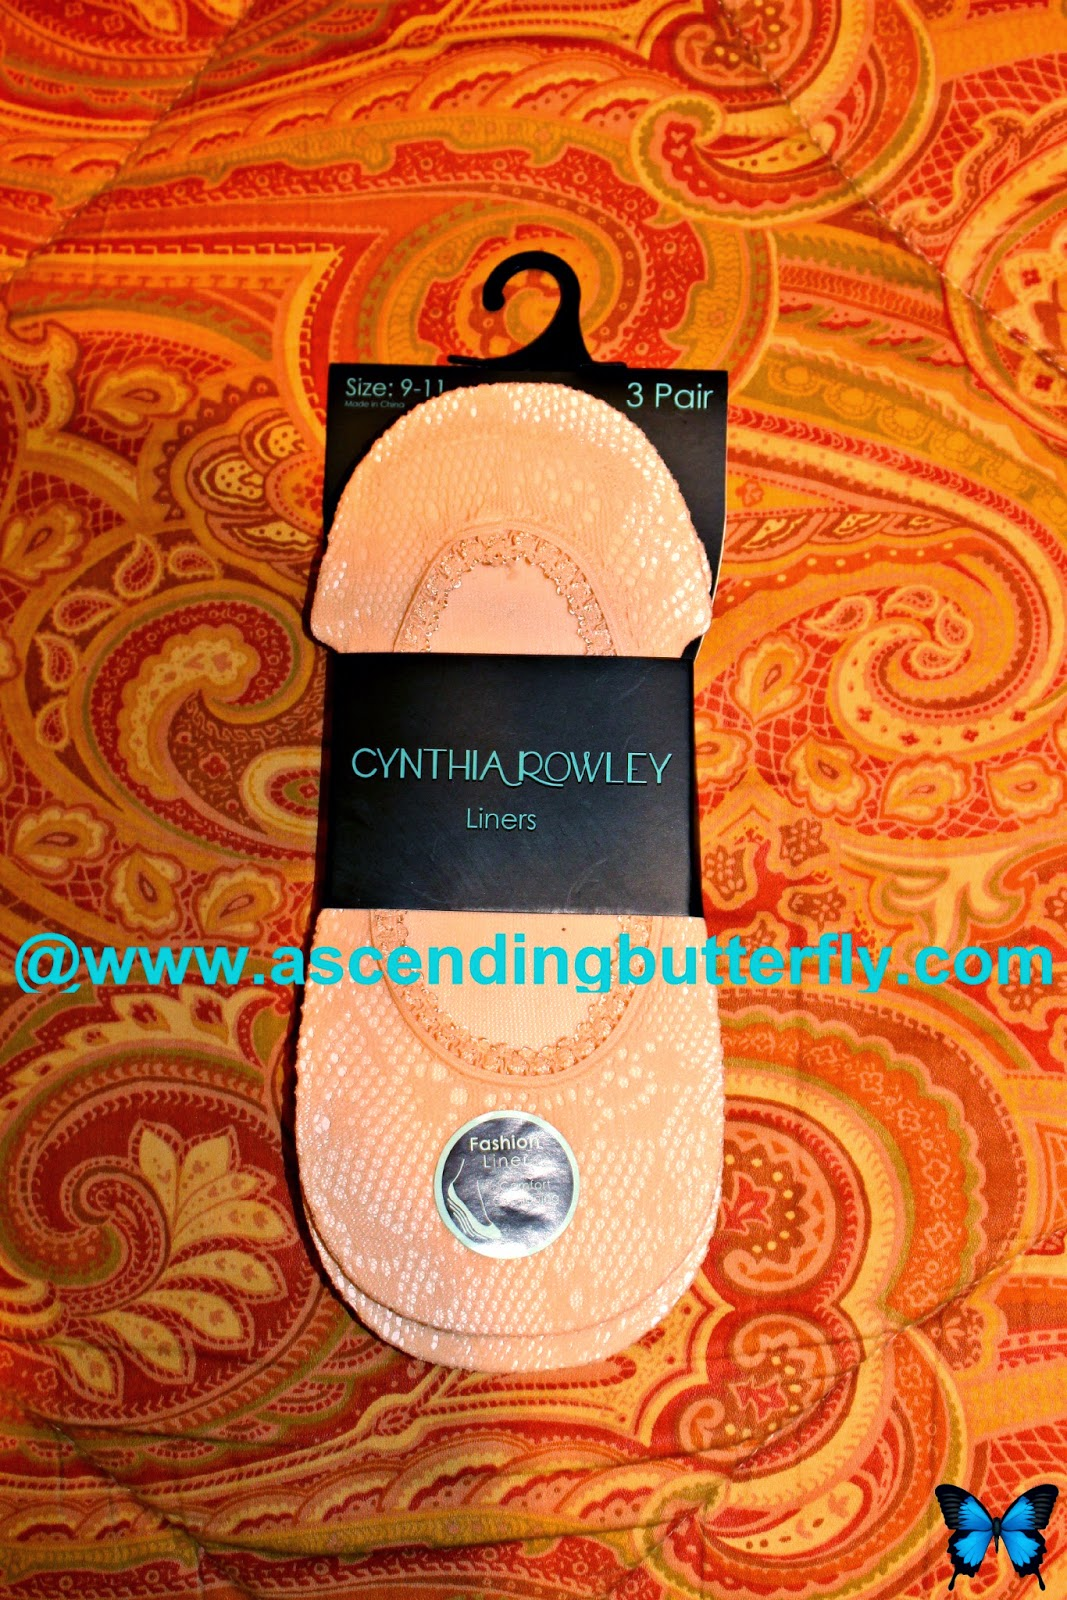 Cynthia Rowley Sock Liners